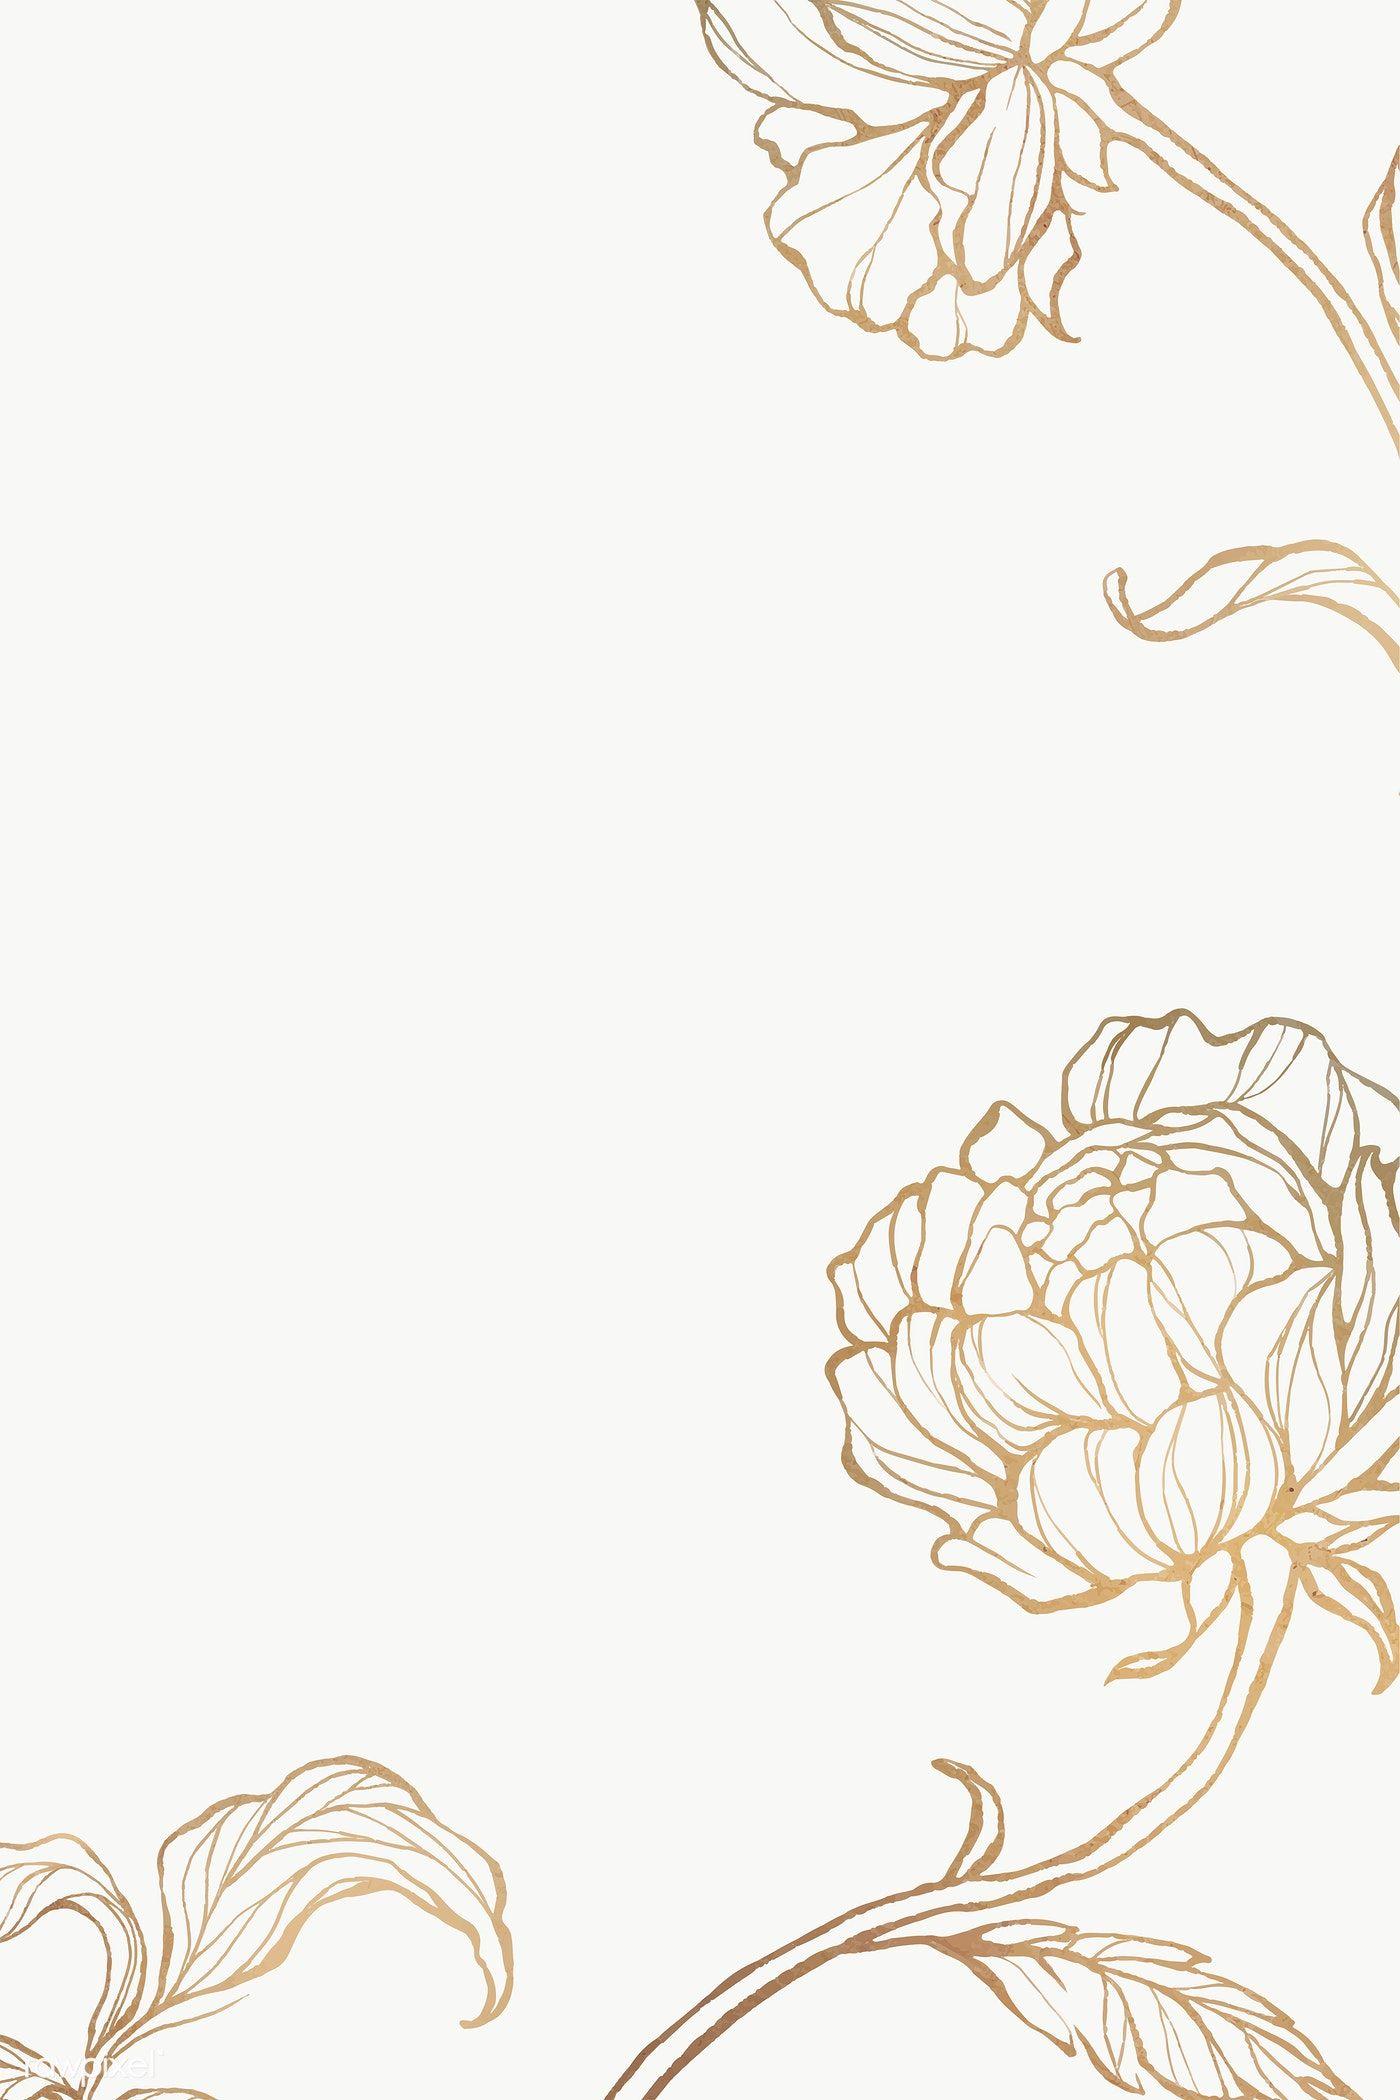 Gold Floral Outline Background Premium Image By Rawpixel Com Nunny Flower Background Wallpaper Marble Background Floral Border Design